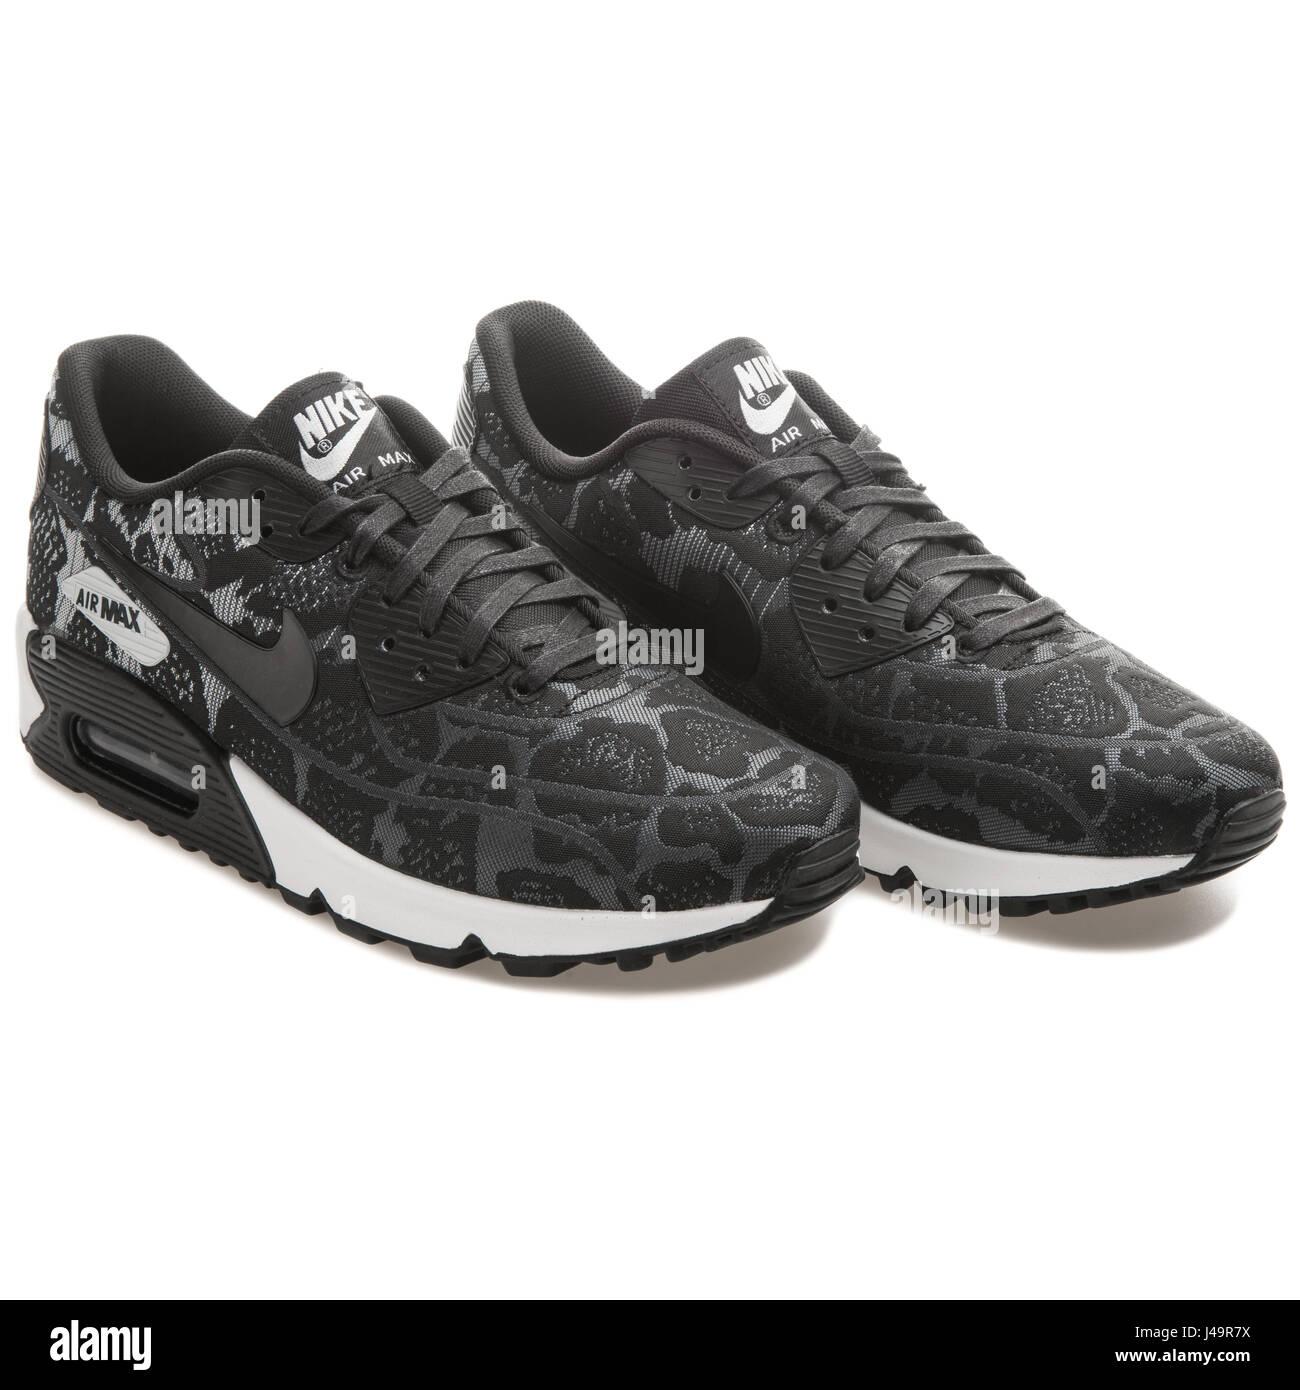 Nike WMNS Air Max 90 JCRD - 749326-001 Stock Photo - Alamy